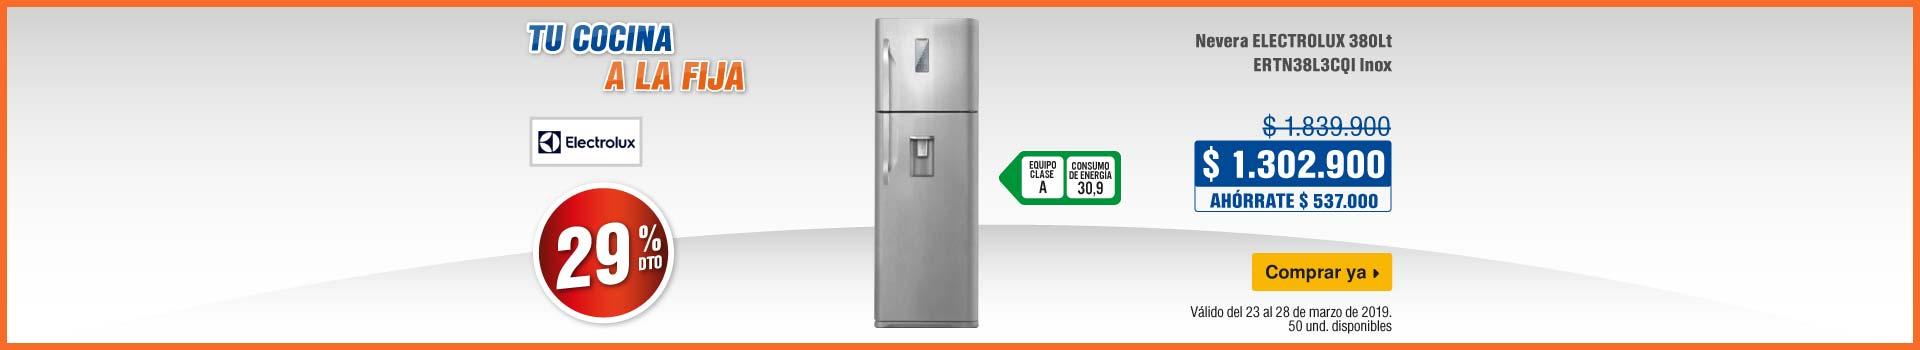 AK-KT-mayores-3-ELECT-BCAT-refrigeracion-ELECTROLUX-230319-extra